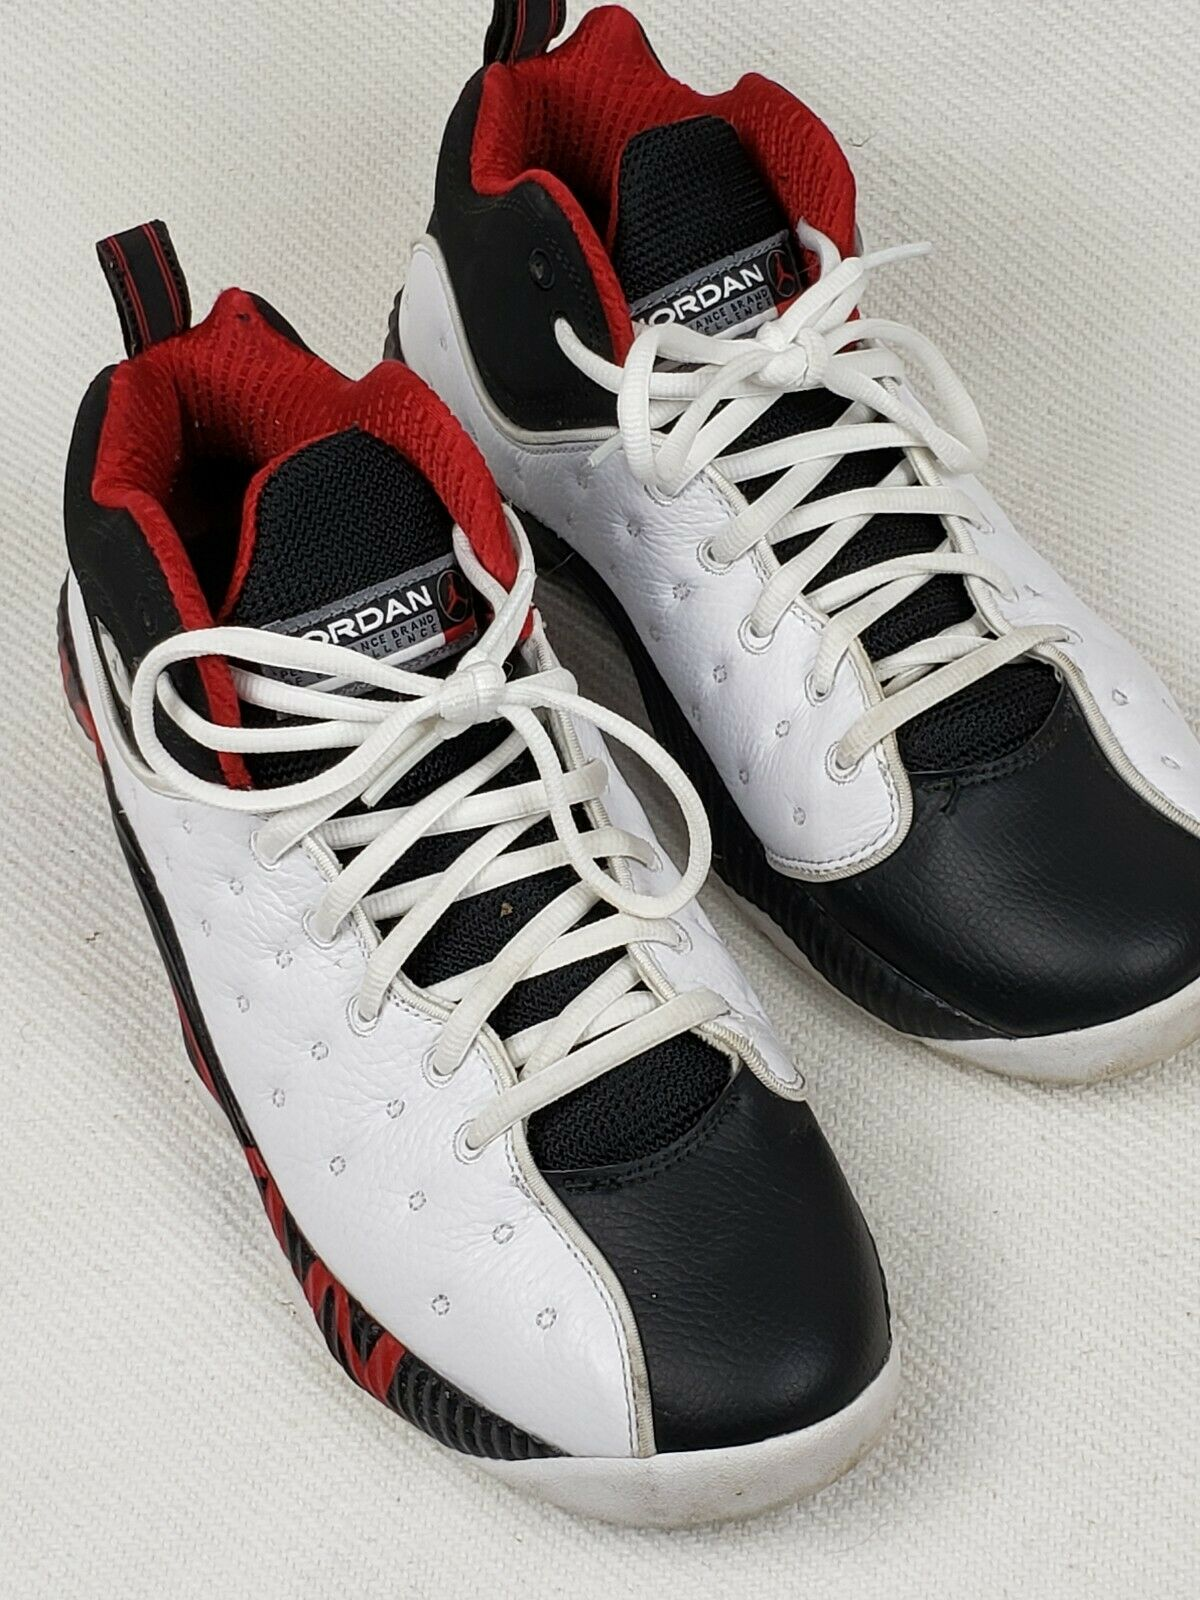 ed098ca022a57 Nike Air Jordan Jumpman Team II 819175-101 Basketball shoes Men SZ 9.5 With  Box